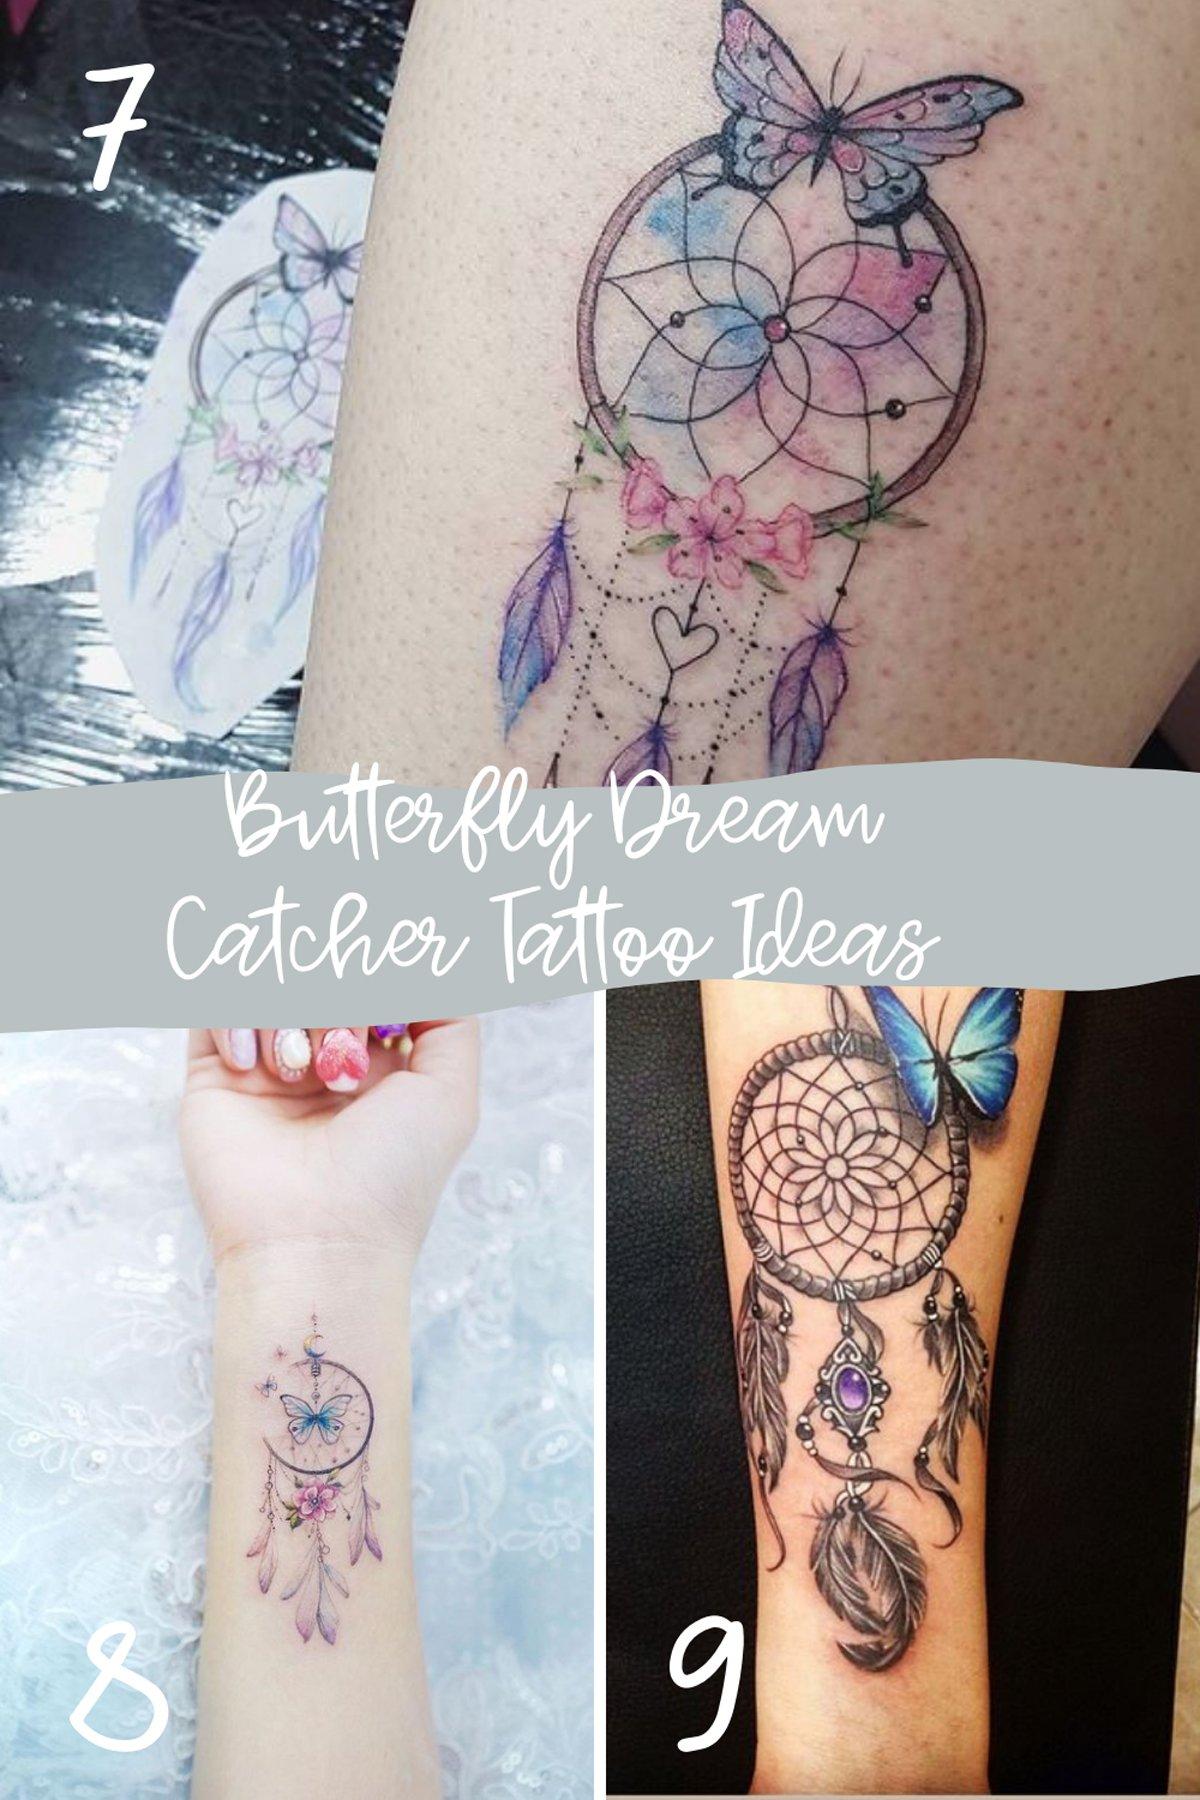 Butterfly Dream Catchers Tattoo Ideas